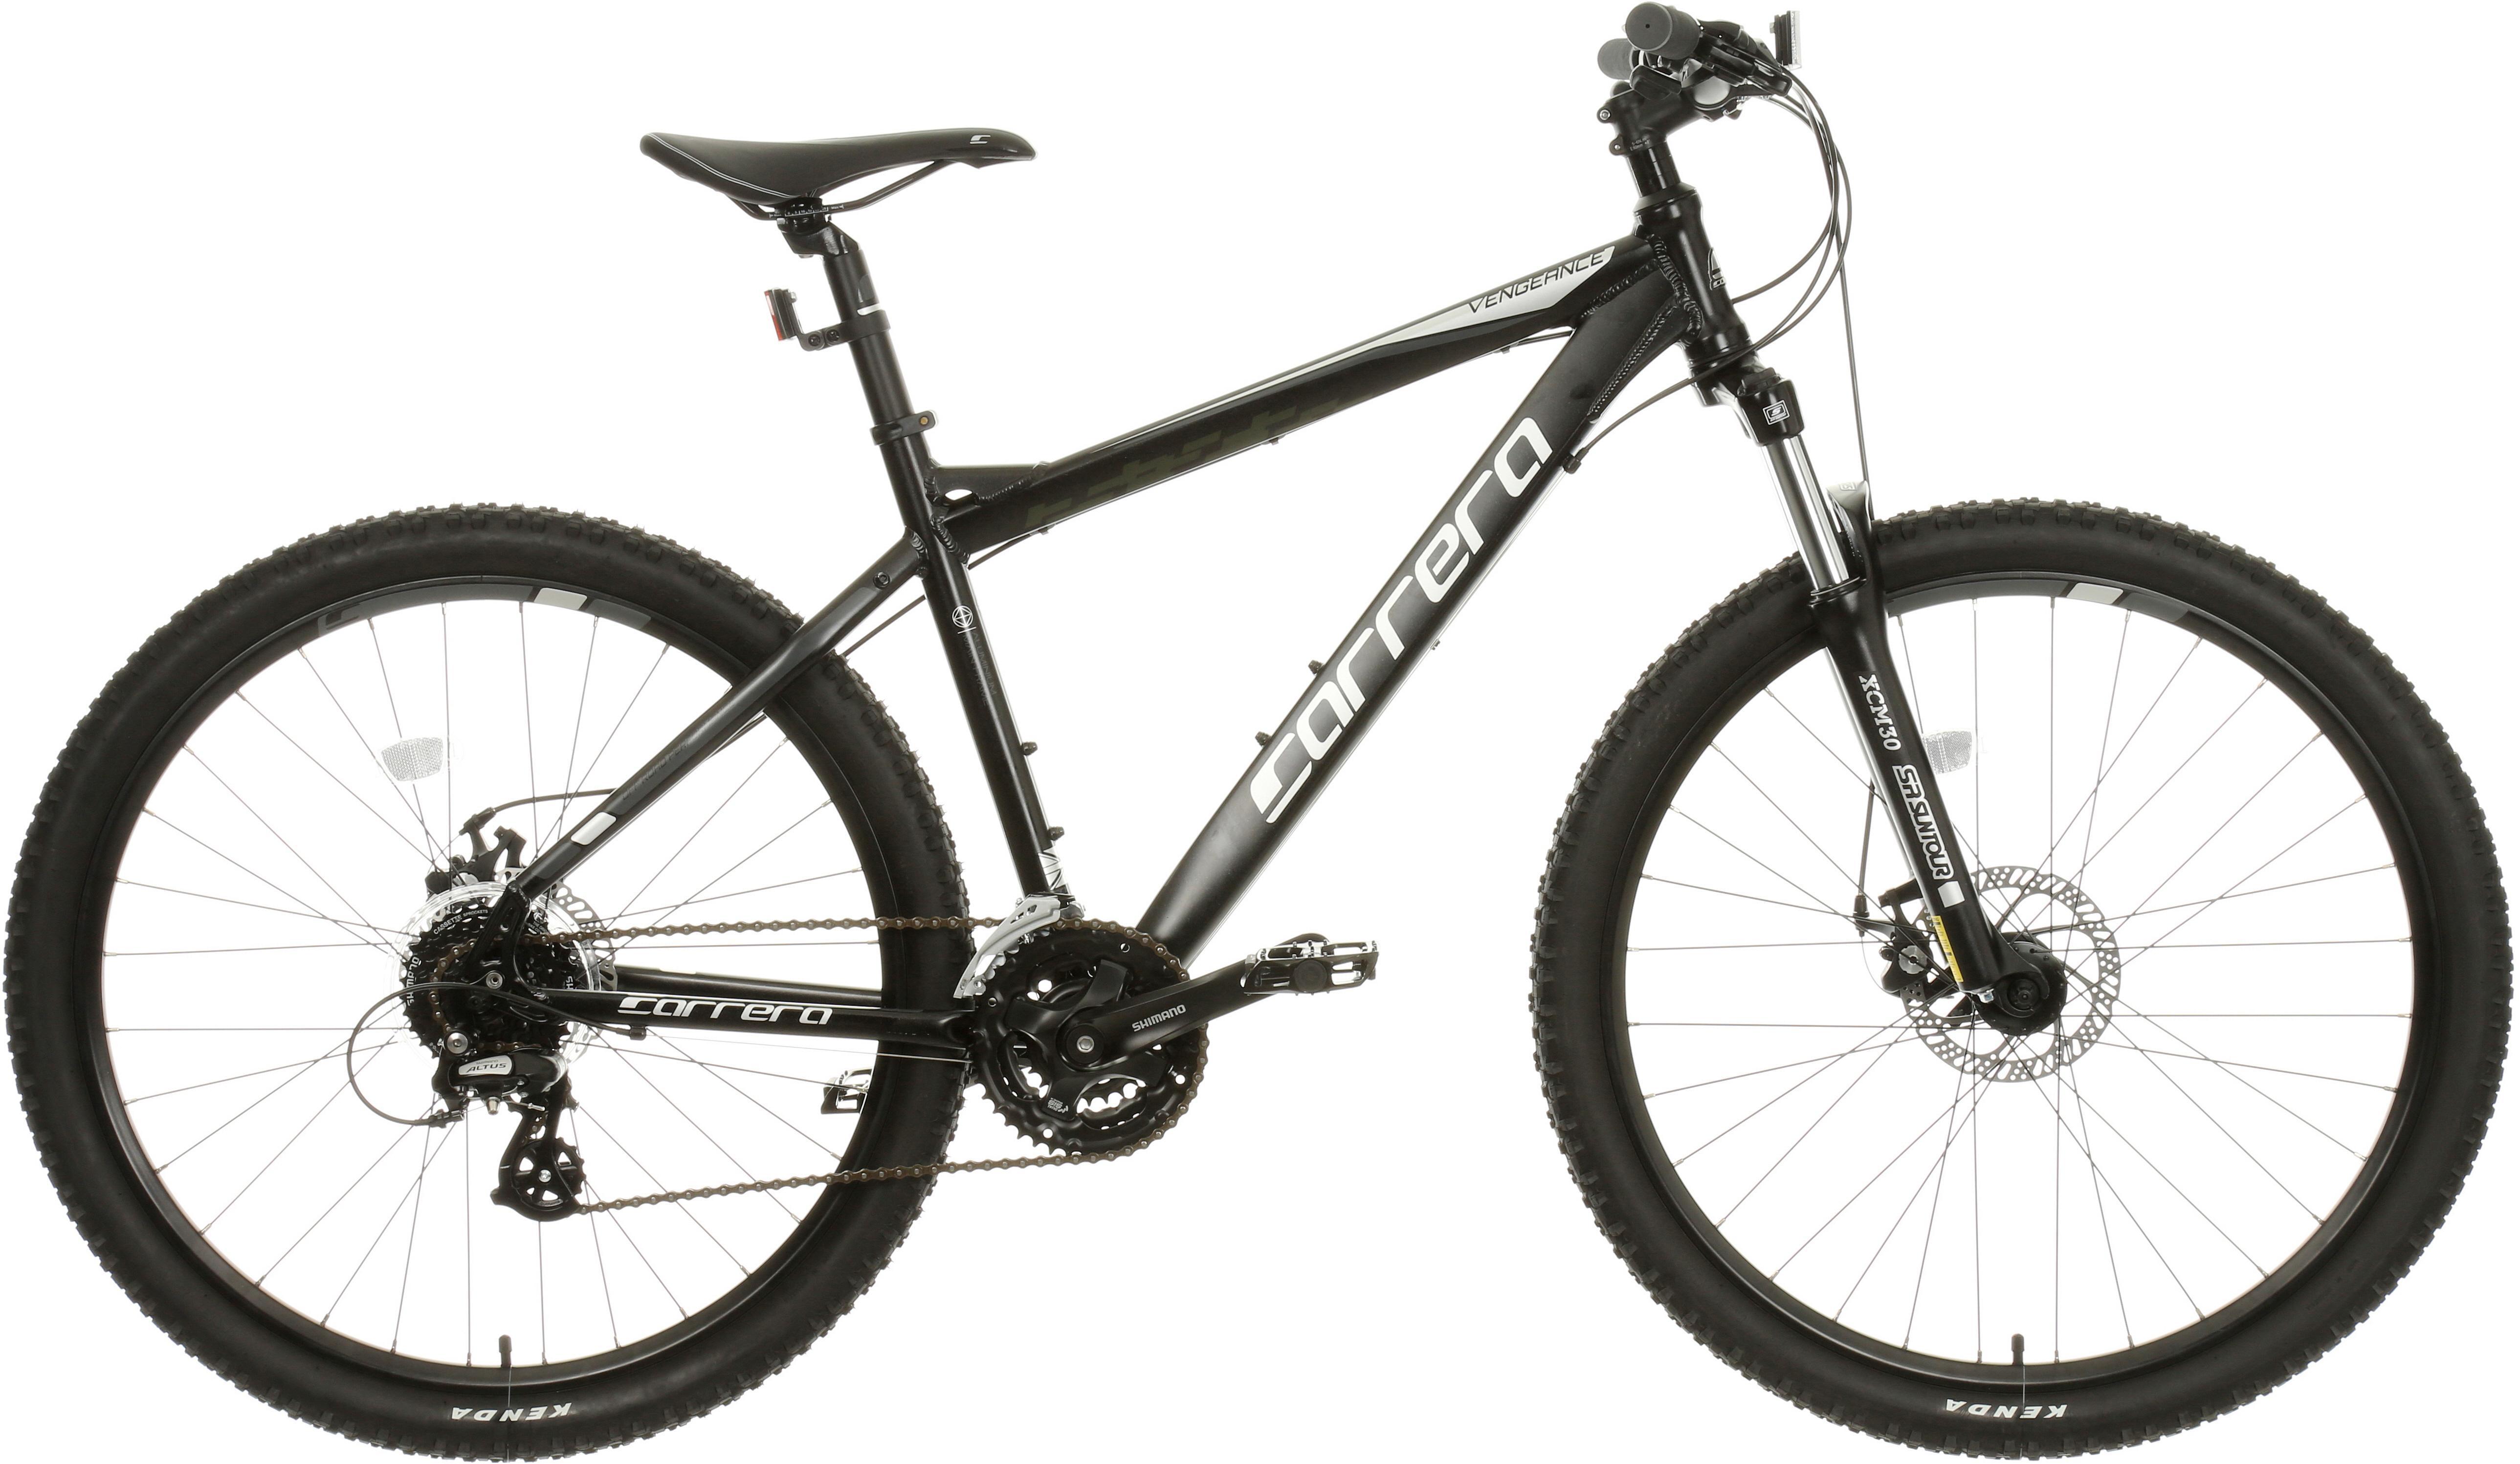 Carrera Vengeance Mens Mountain Bike - Black, XS